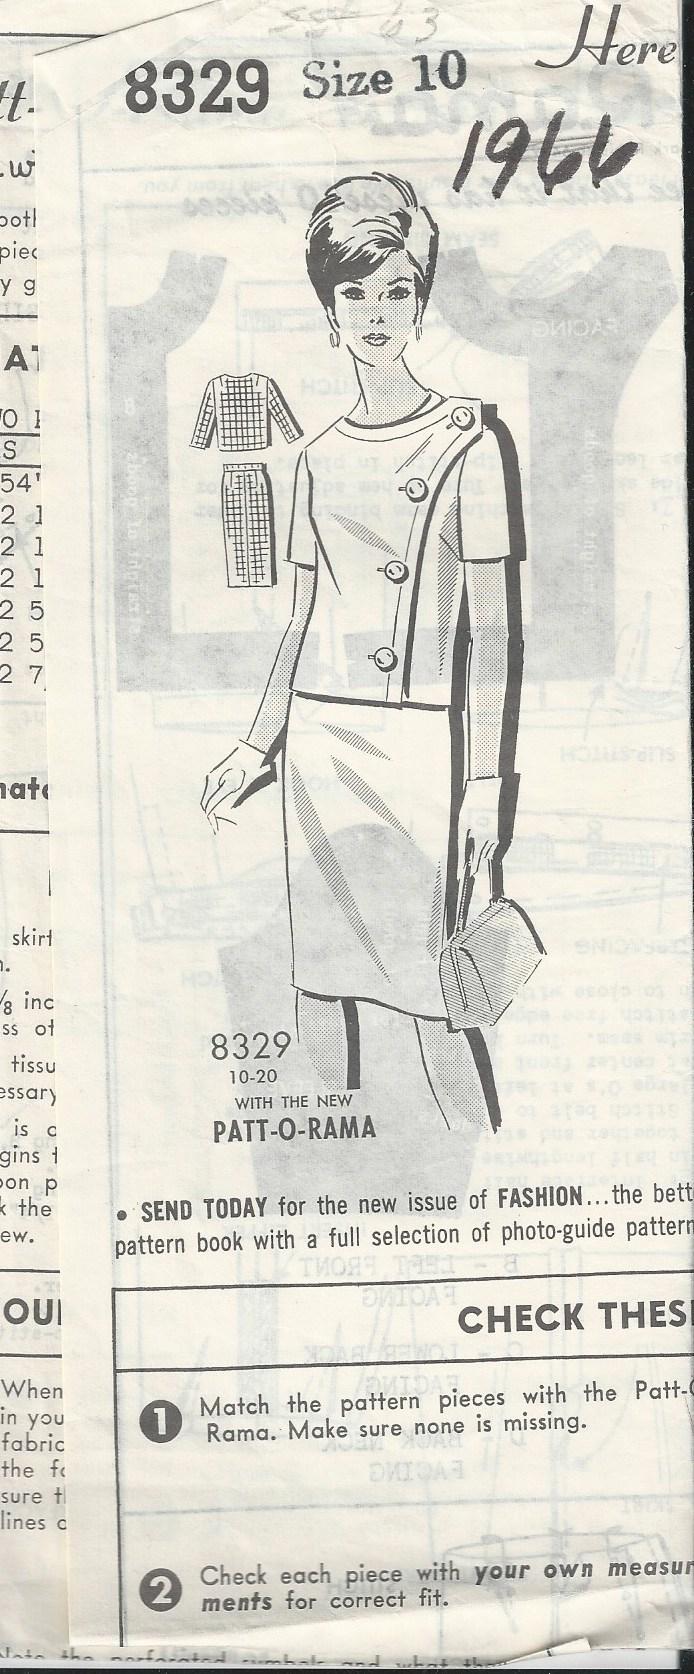 Patt-O-Rama 8329